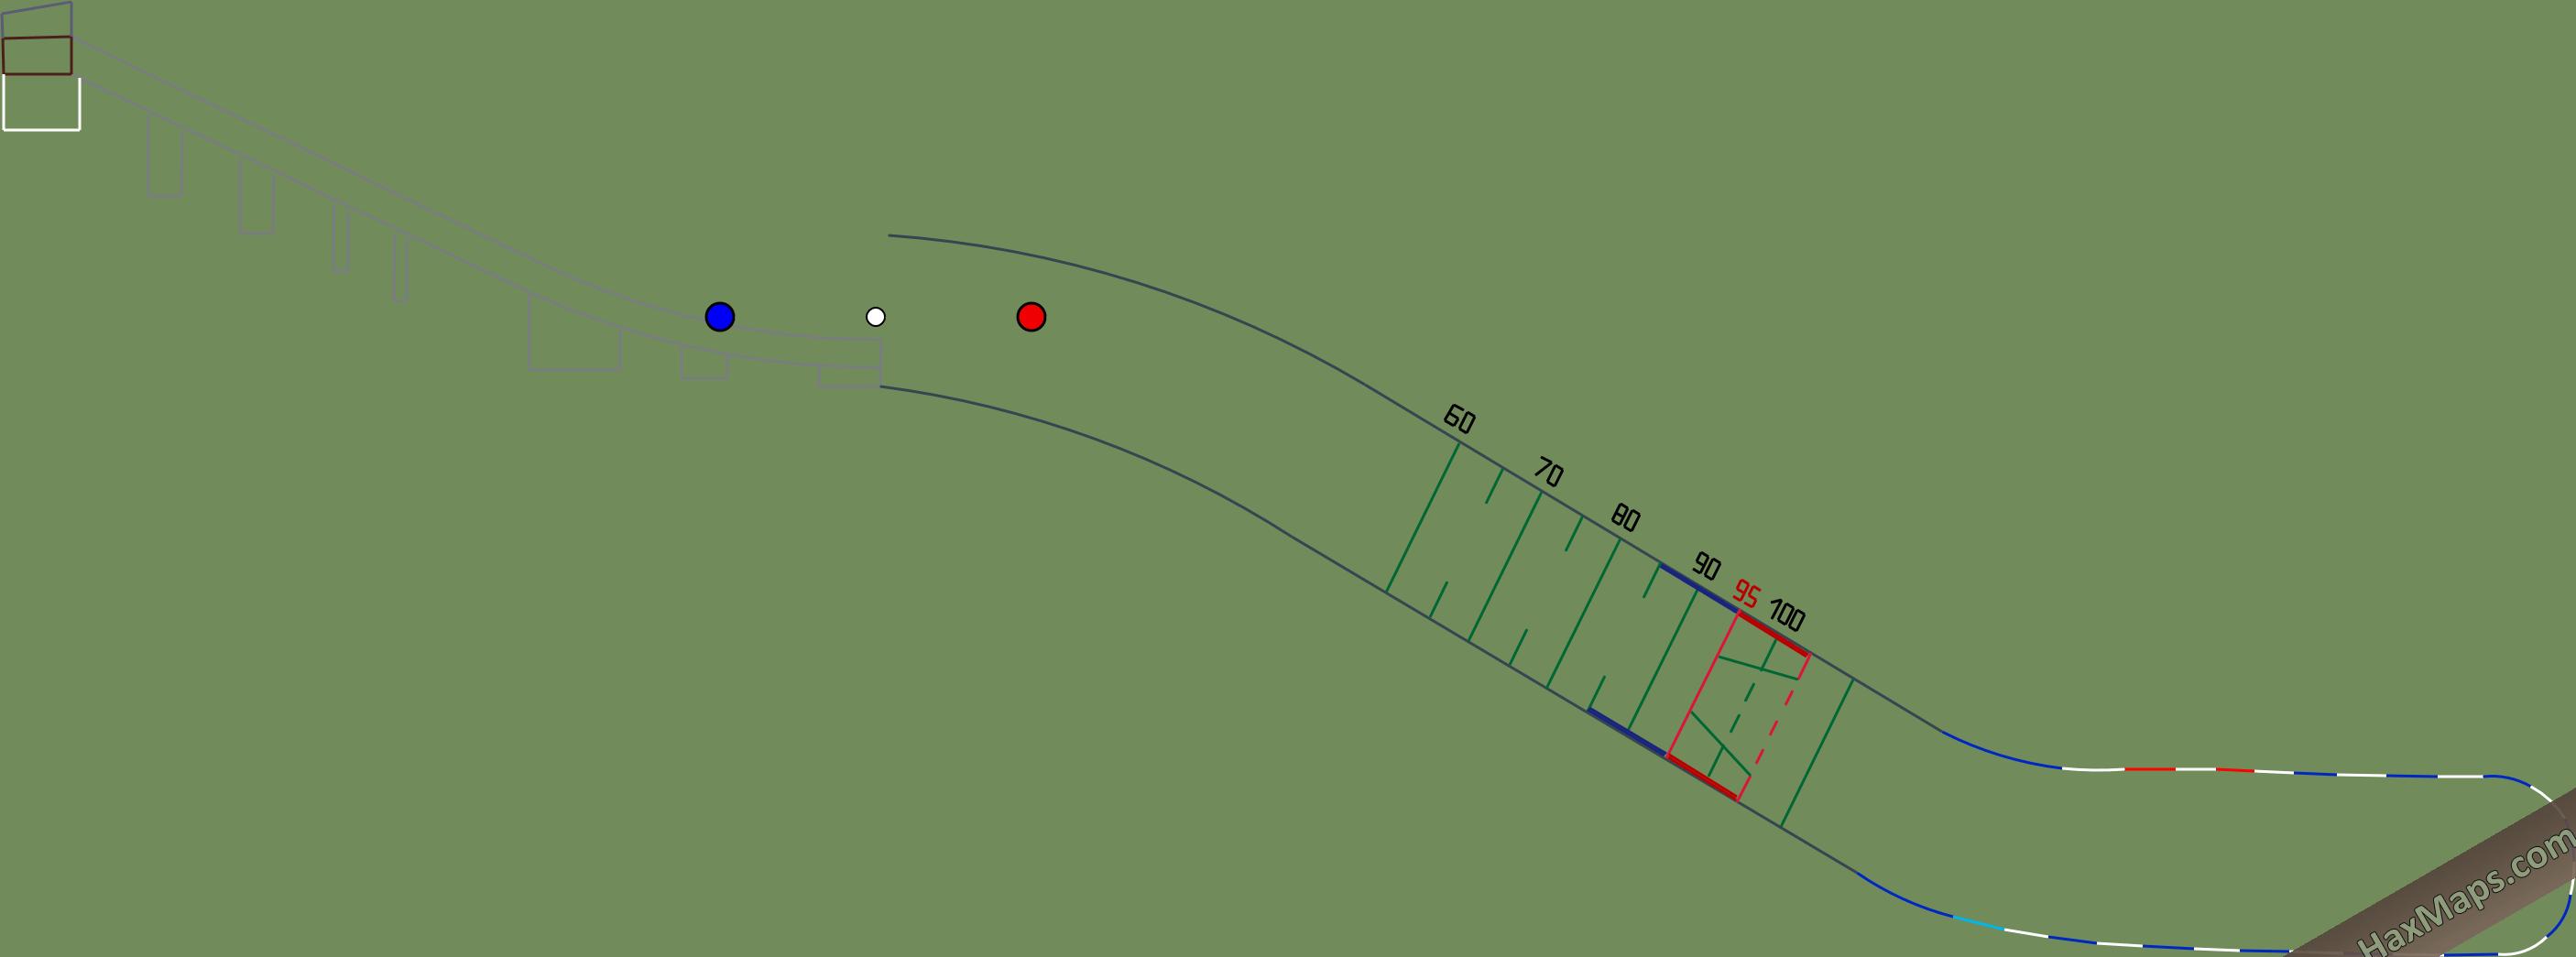 hax ball maps   Predazzo K95  HS104